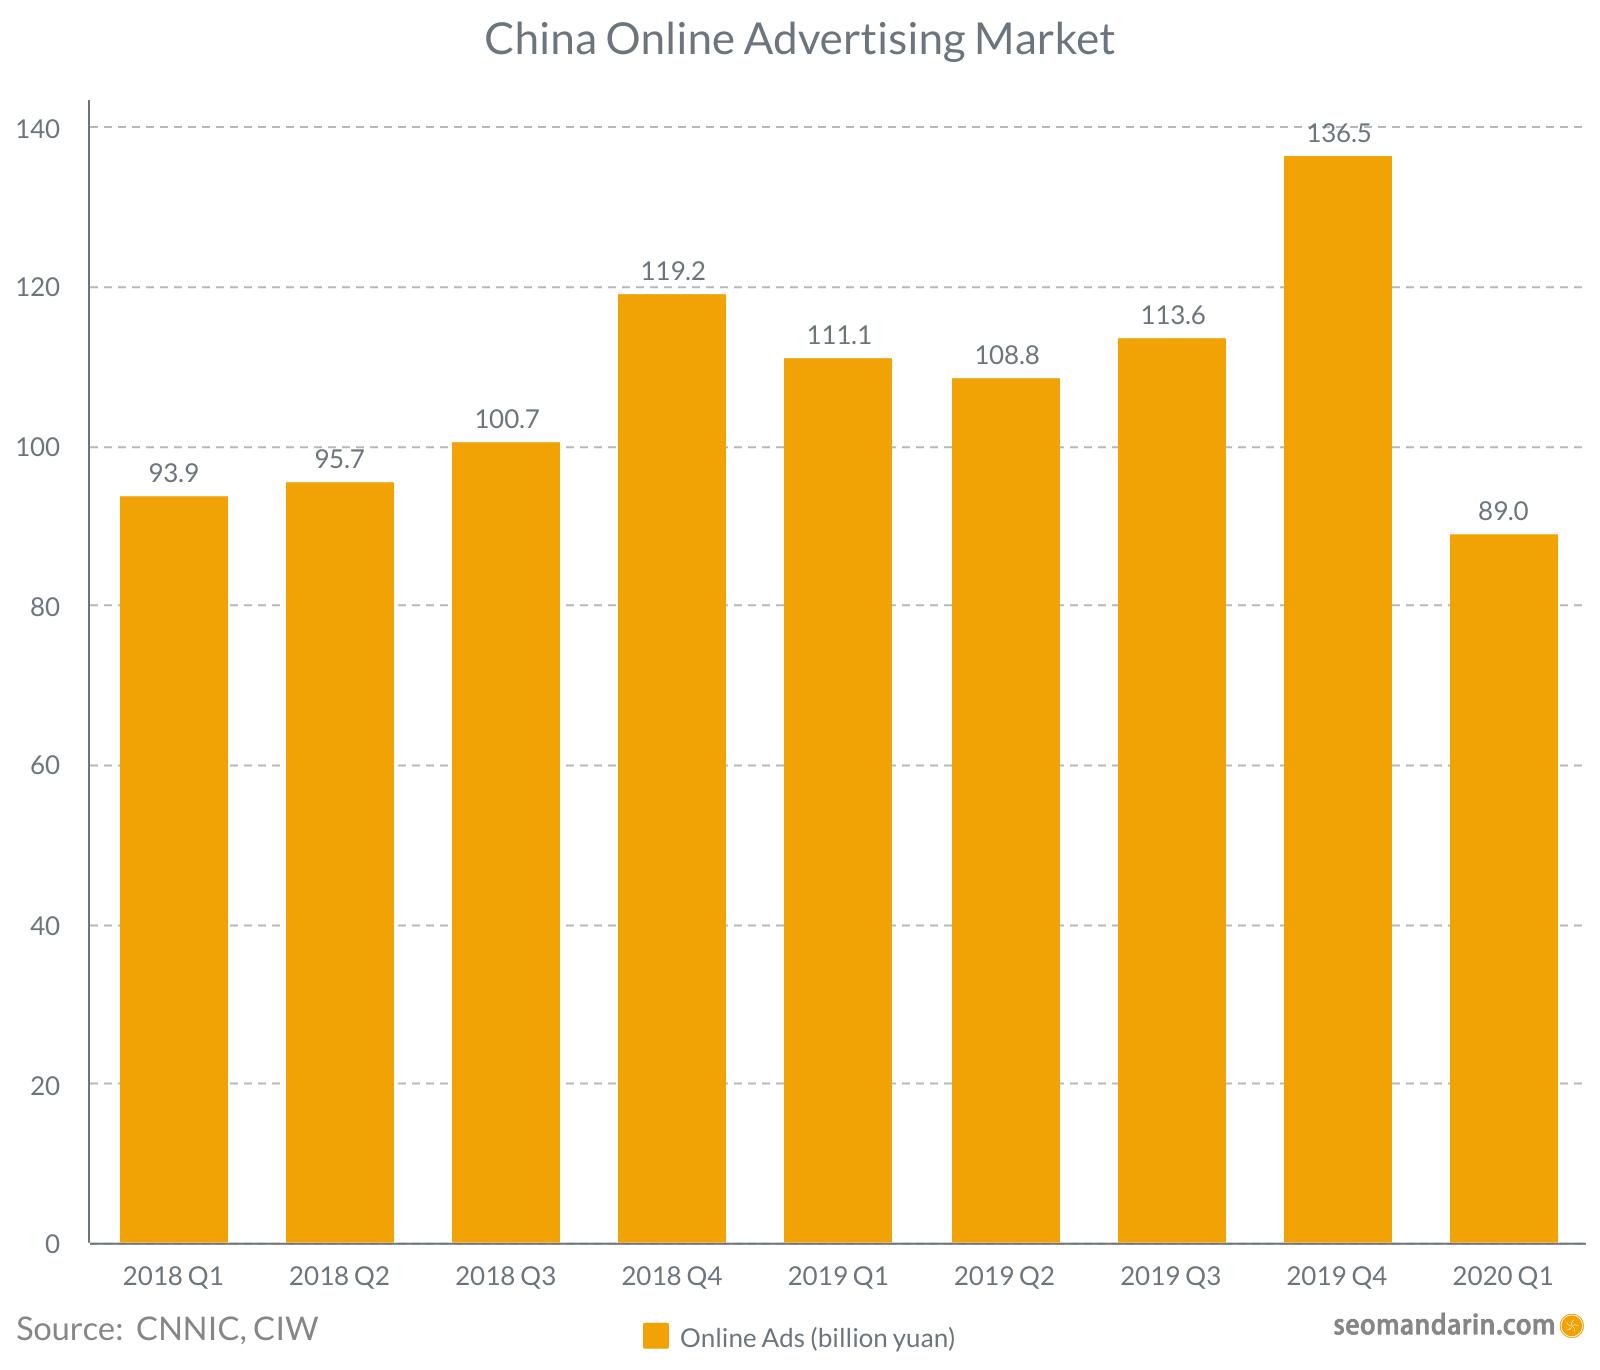 China online advertising market 2020